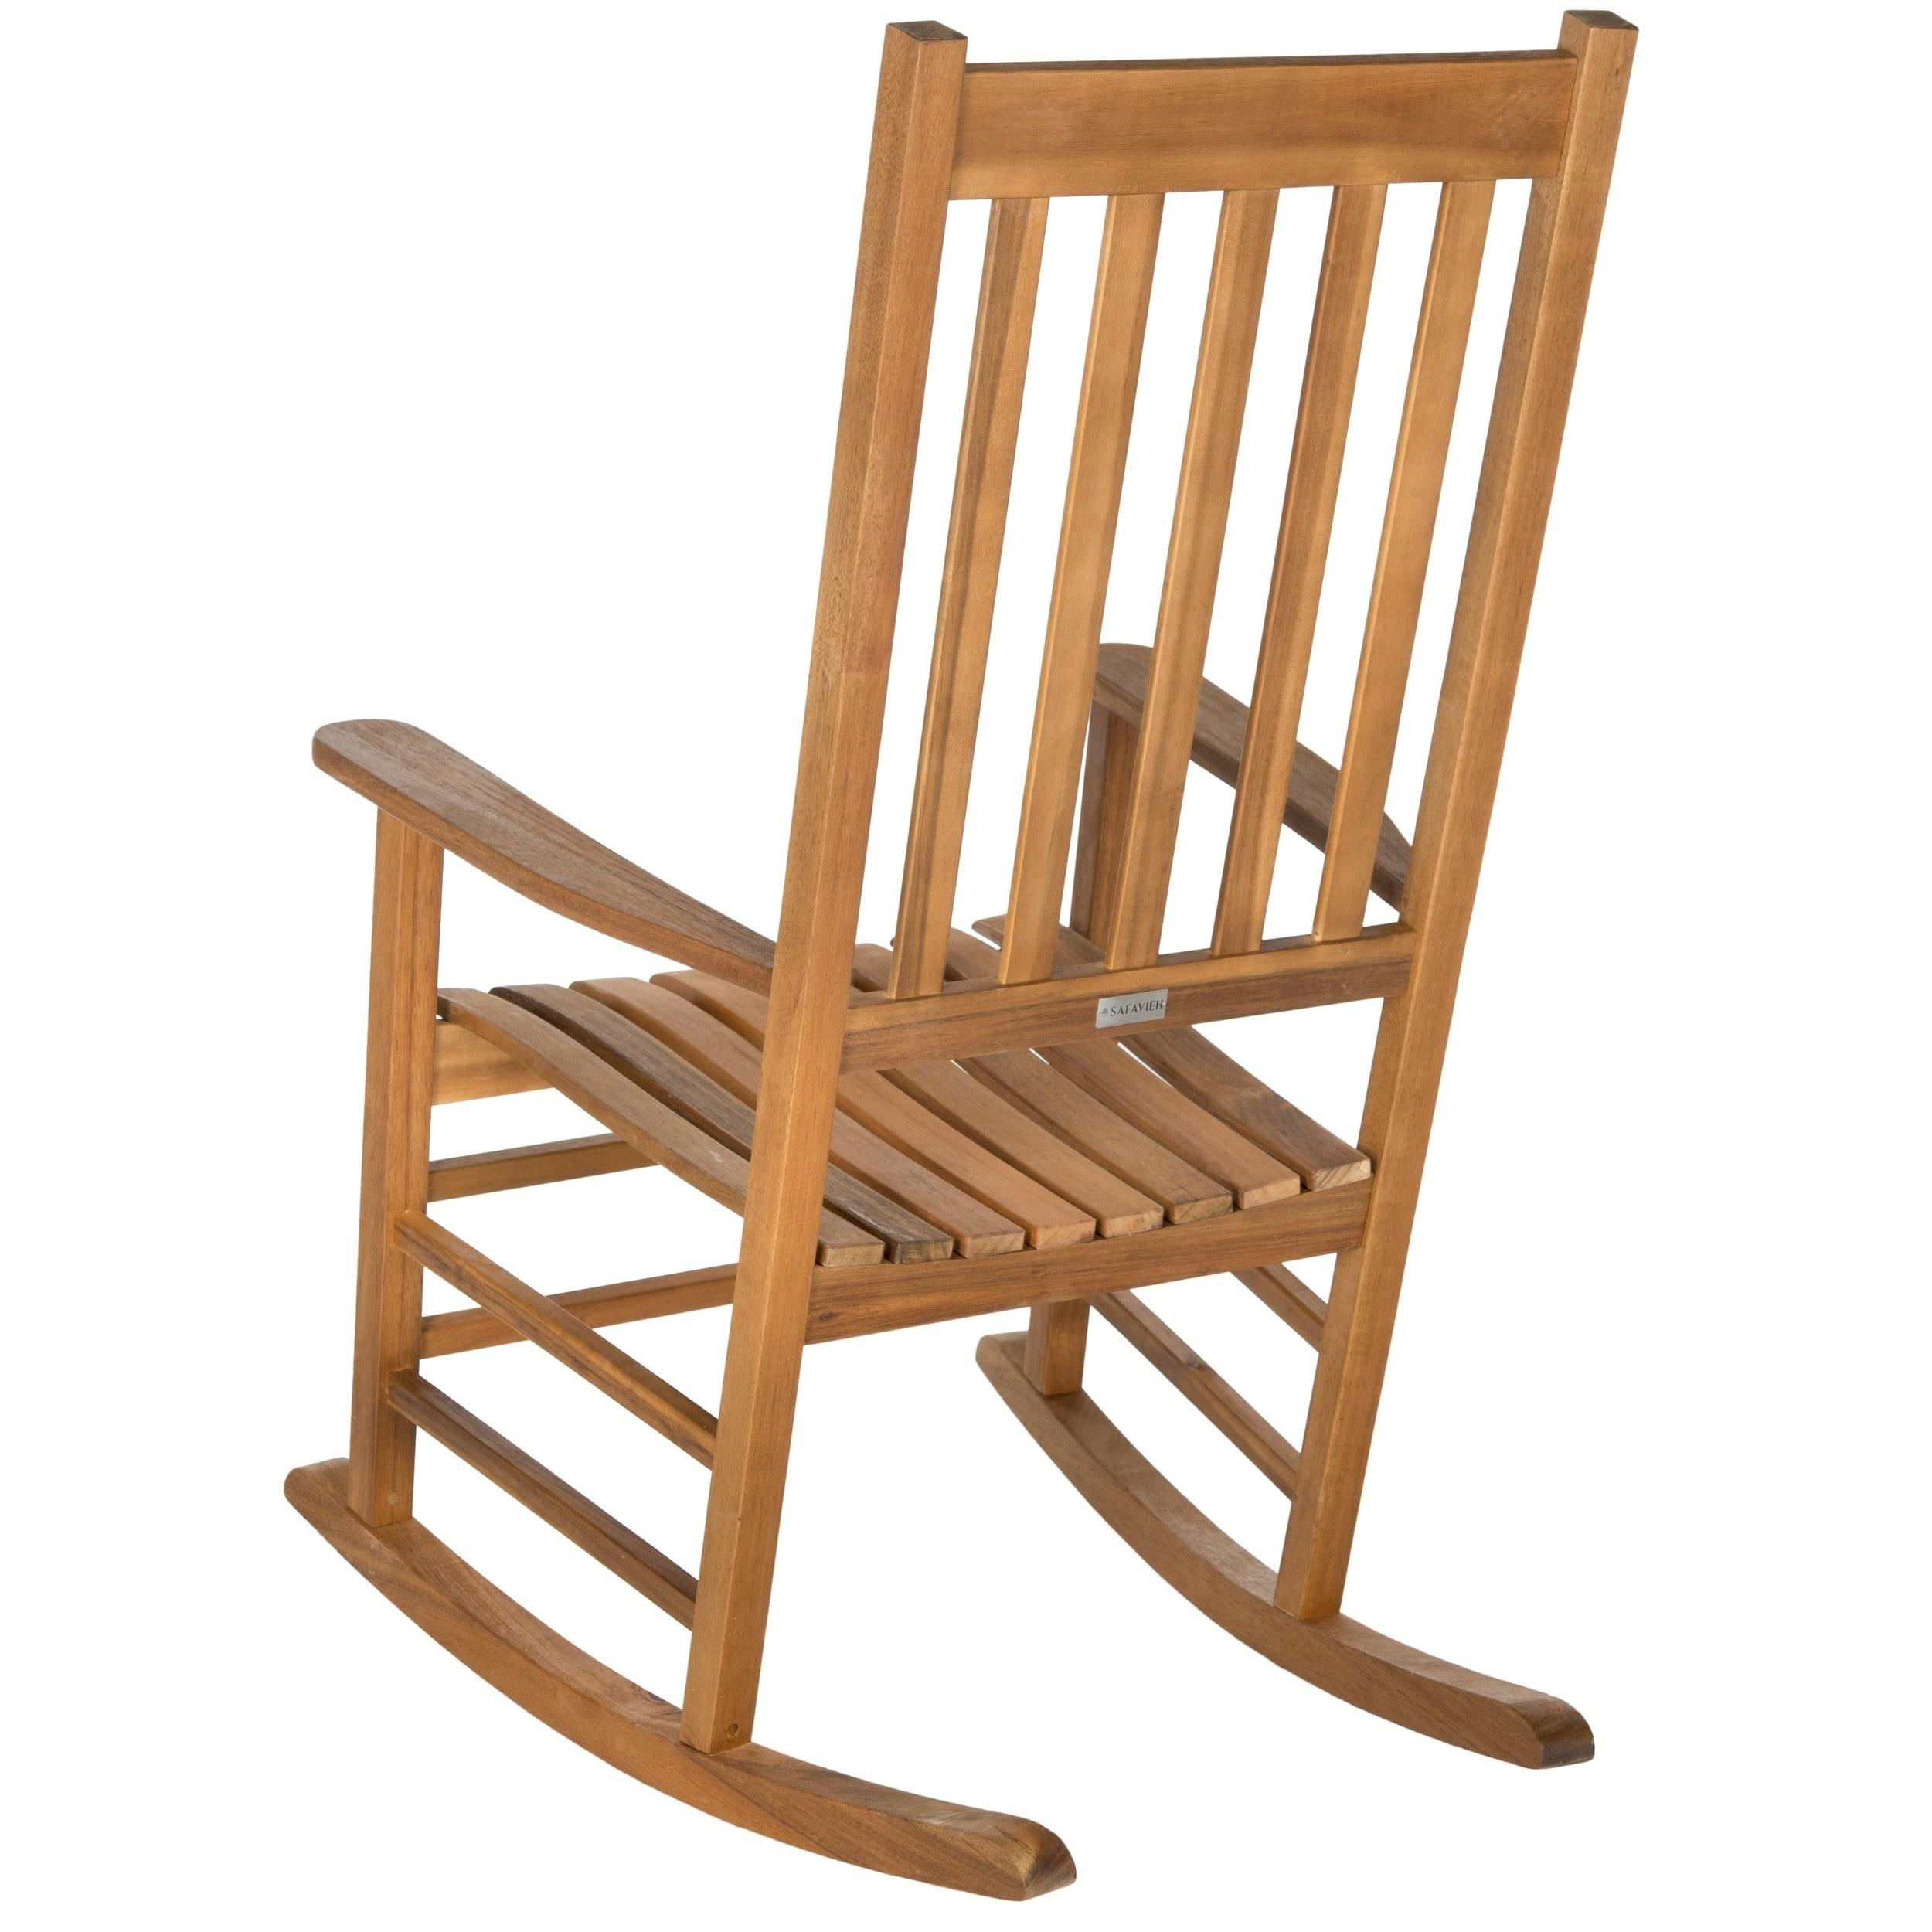 Shop Safavieh Shasta Finish Brown Acacia Wood Rocking Chair On